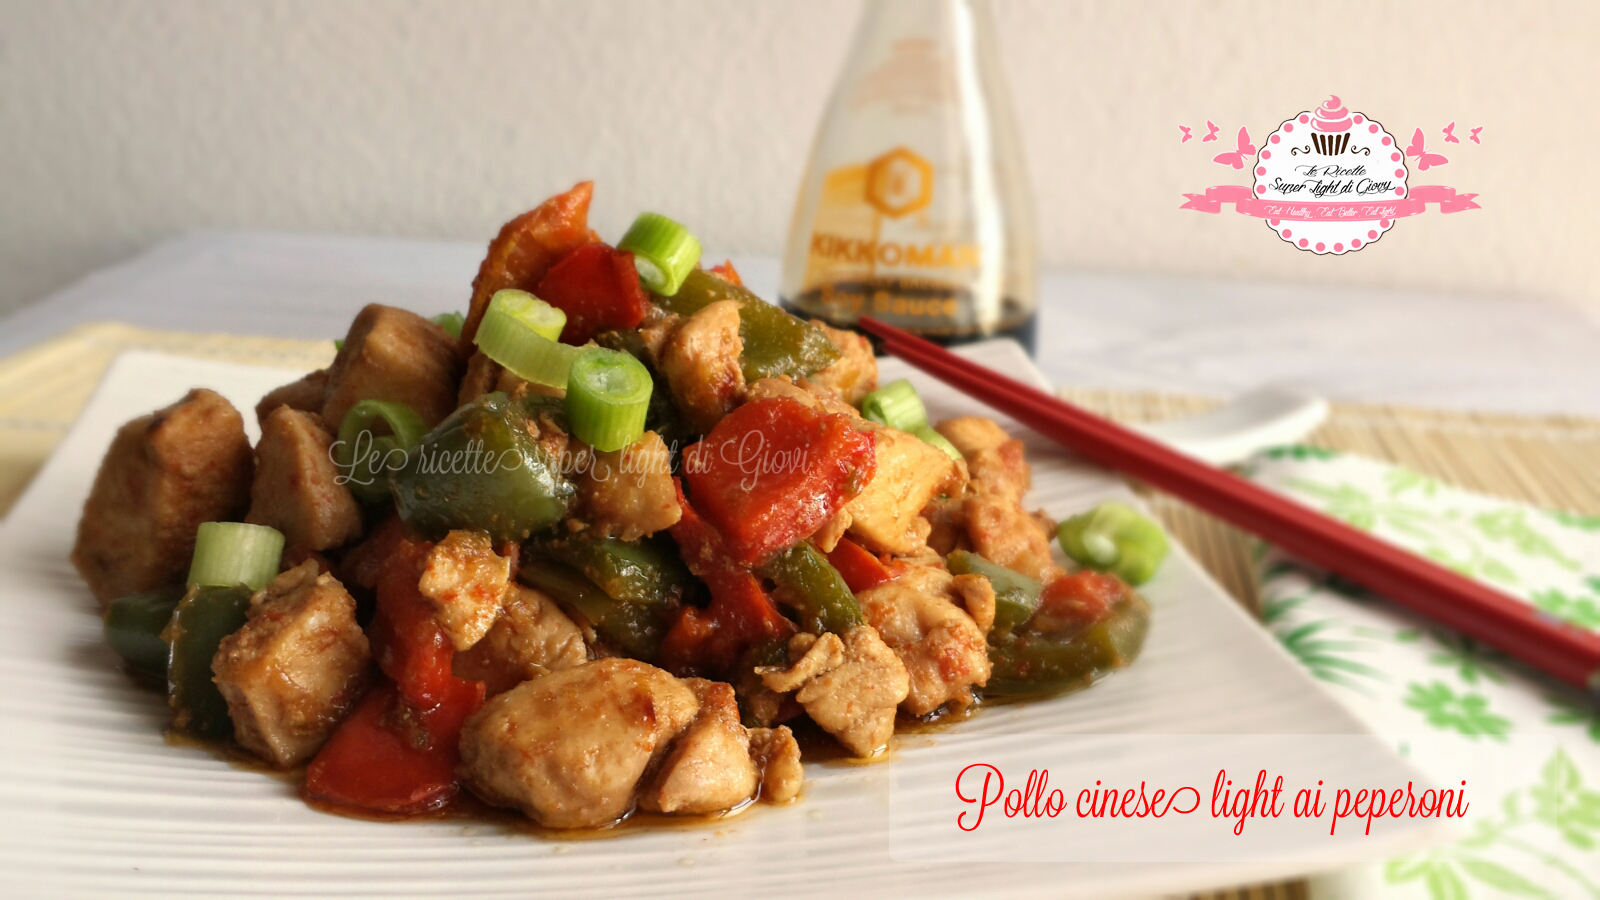 Ricette cucina cinese light